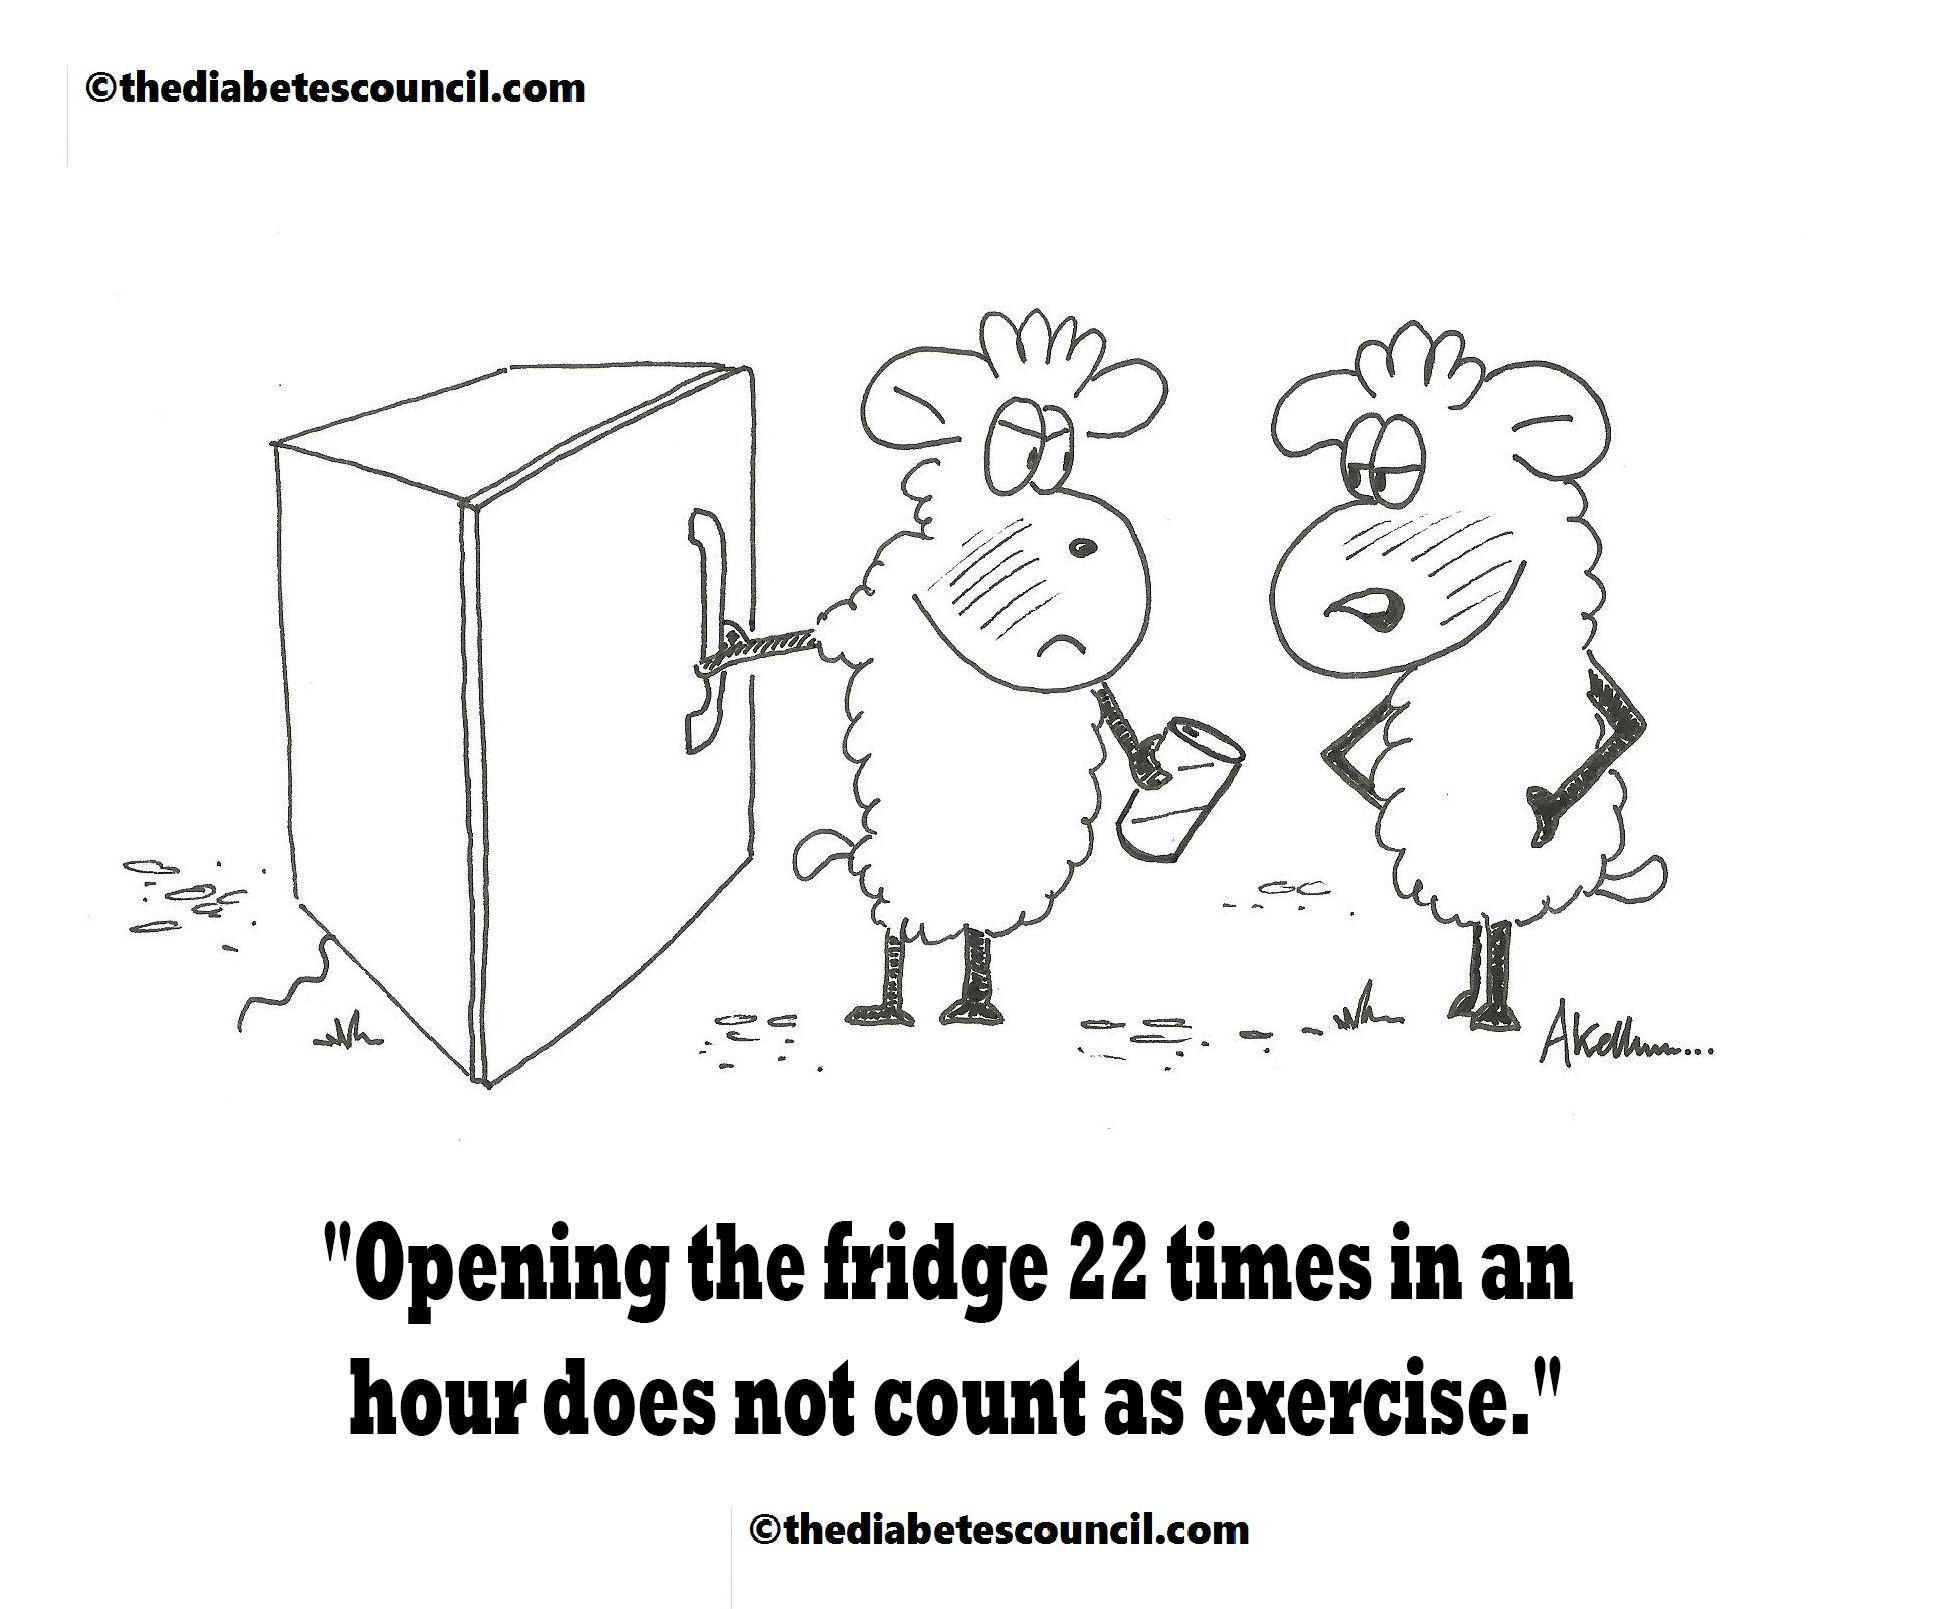 Workout anyone #thediabetescouncil #diabetescartoons #